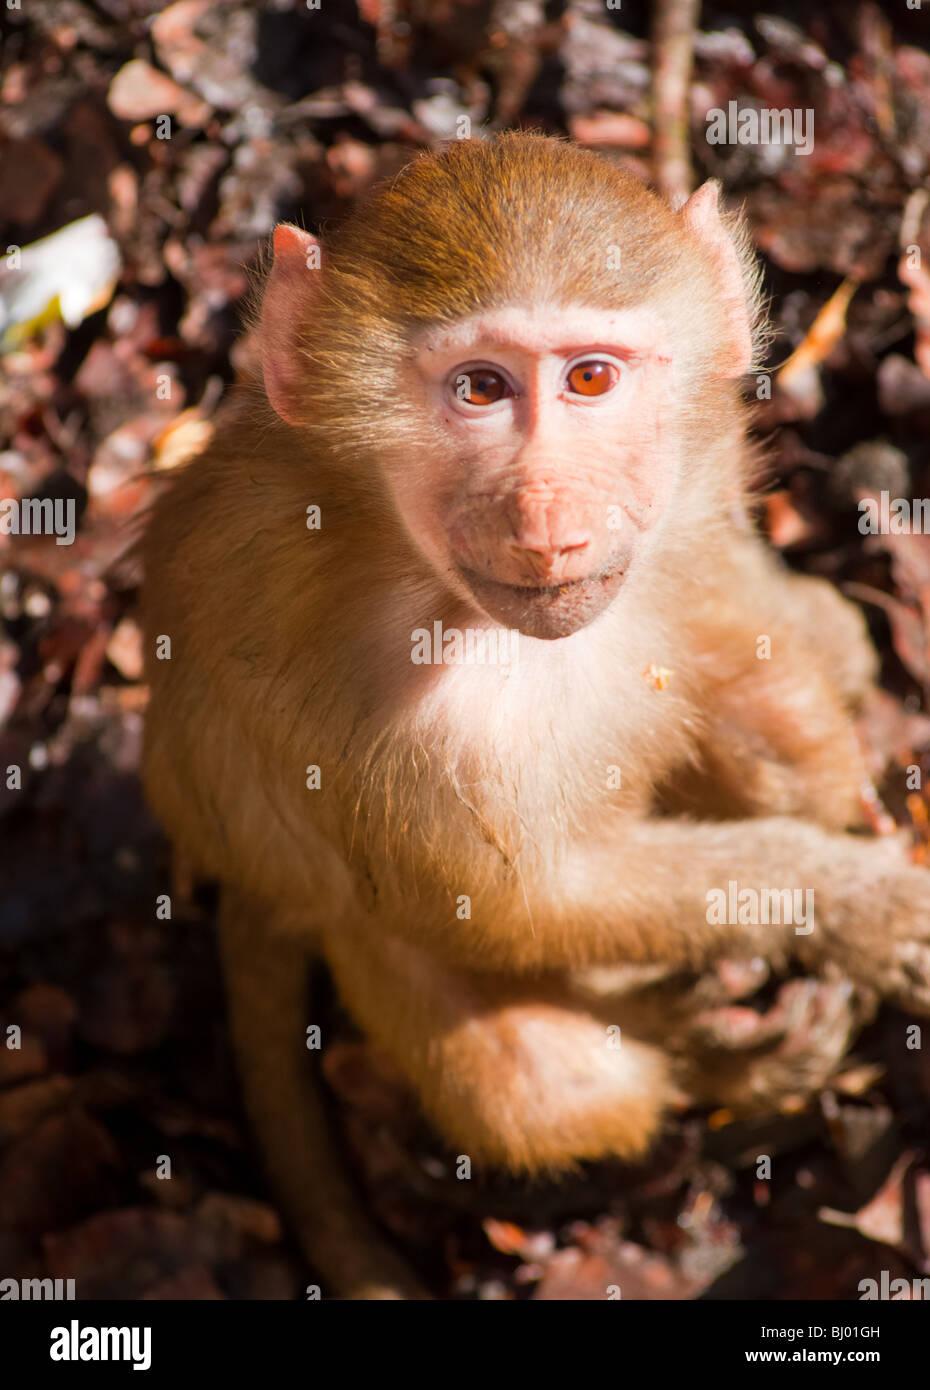 Giovani Hamadryas baboon cerca sinceramente. Immagini Stock